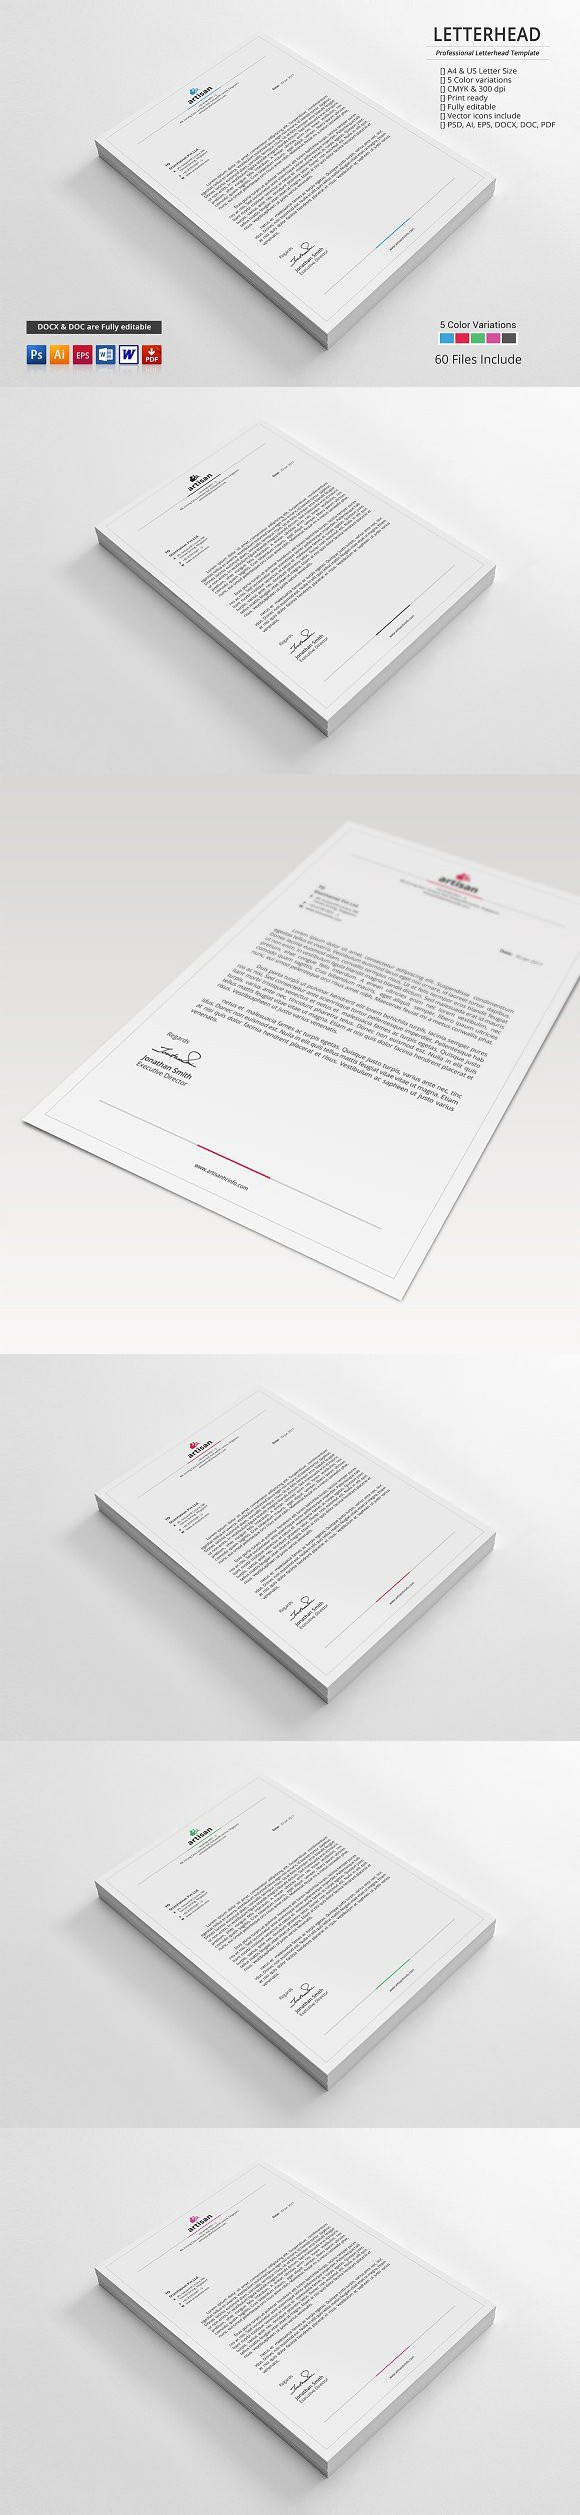 letterhead stationery templates stationery templates pinterest